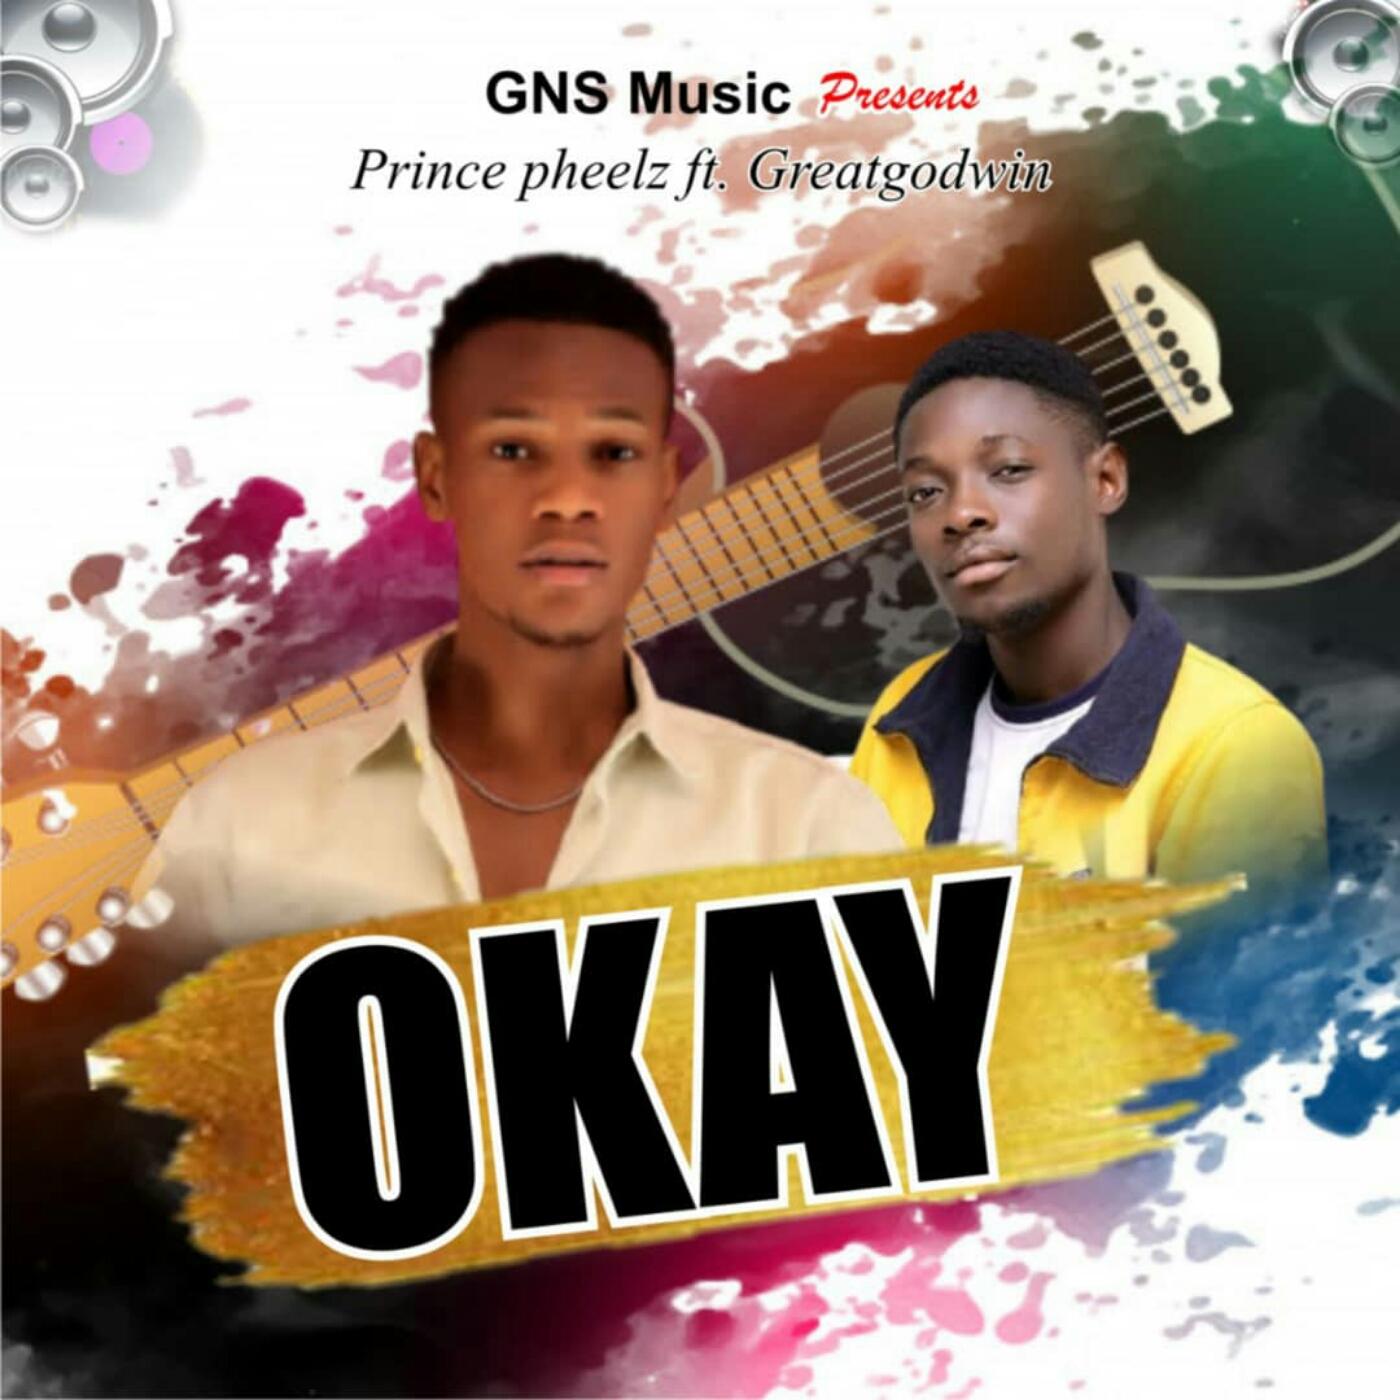 Prince Pheelz - OKAY (feat. Greatgodwin)